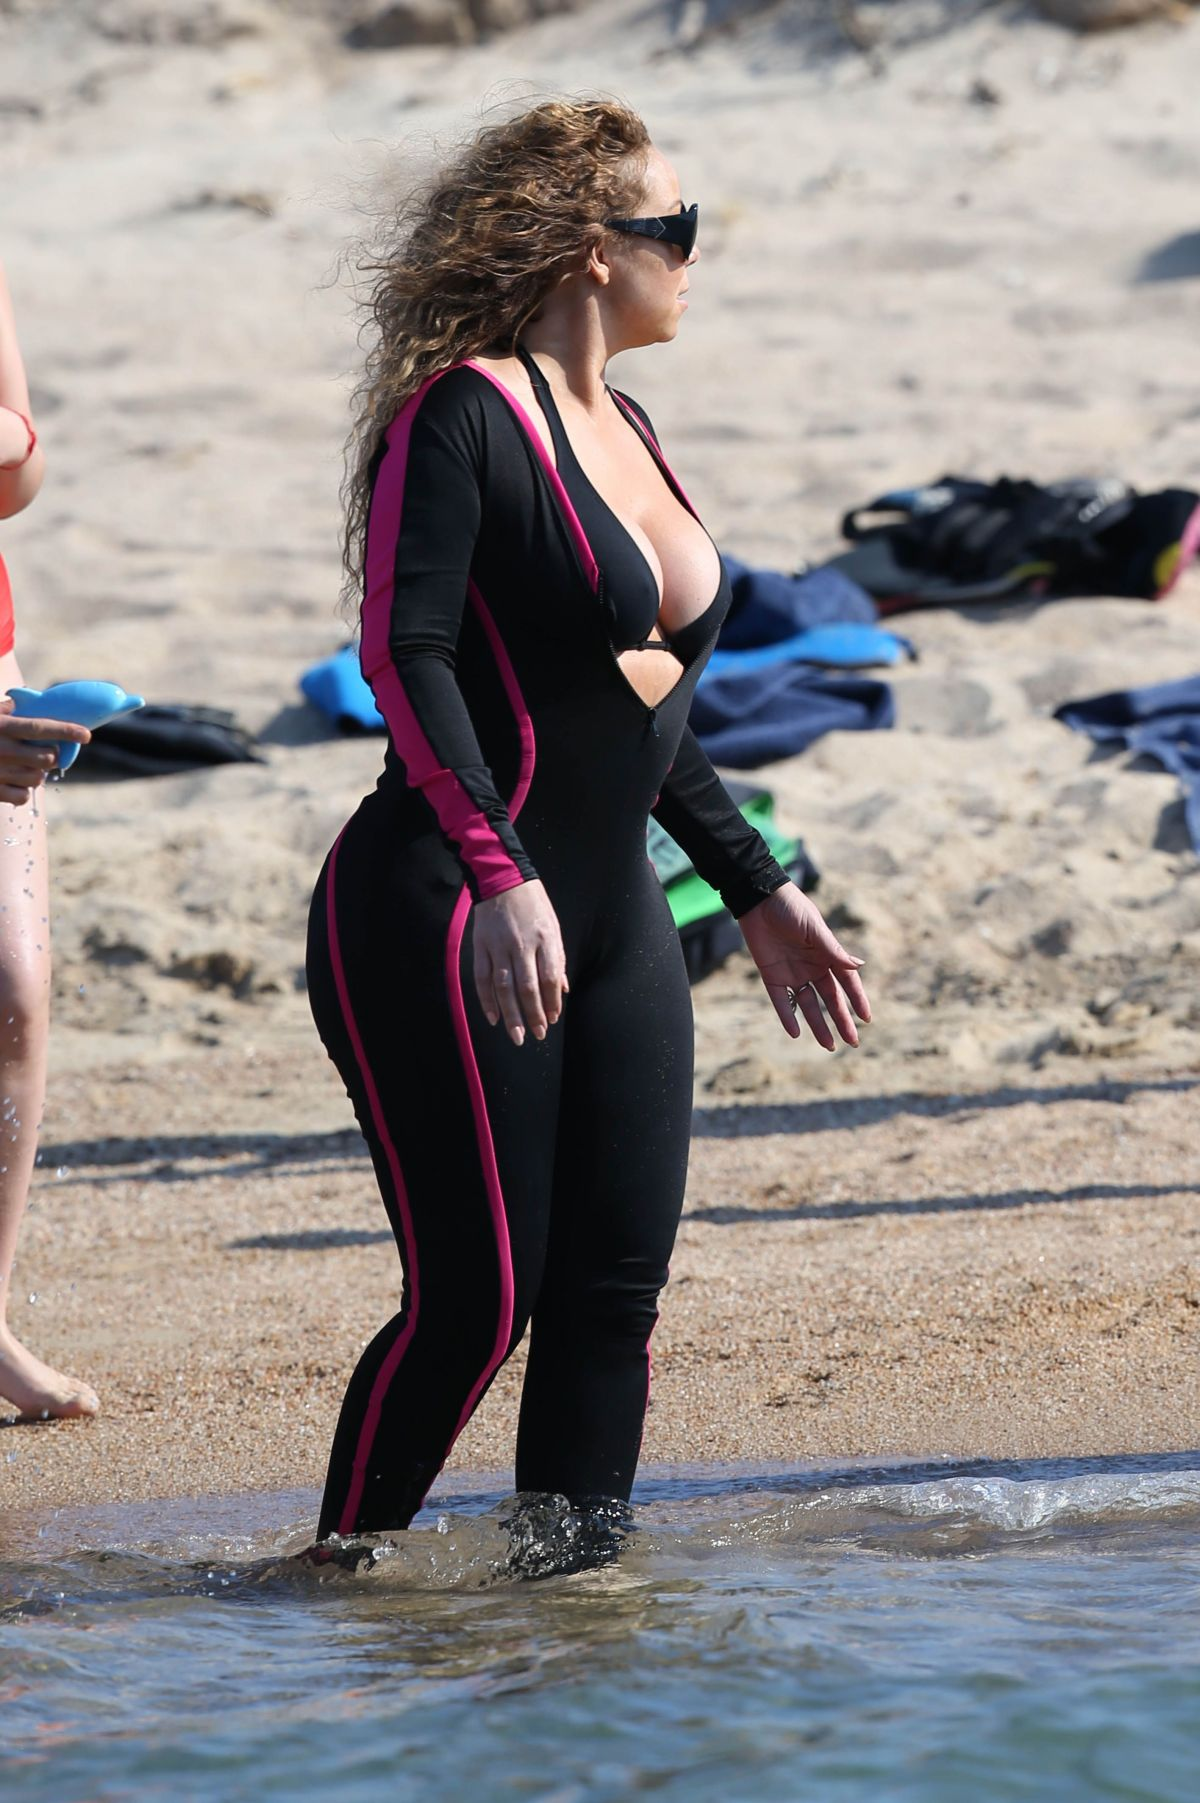 Mariah carey beach pictures